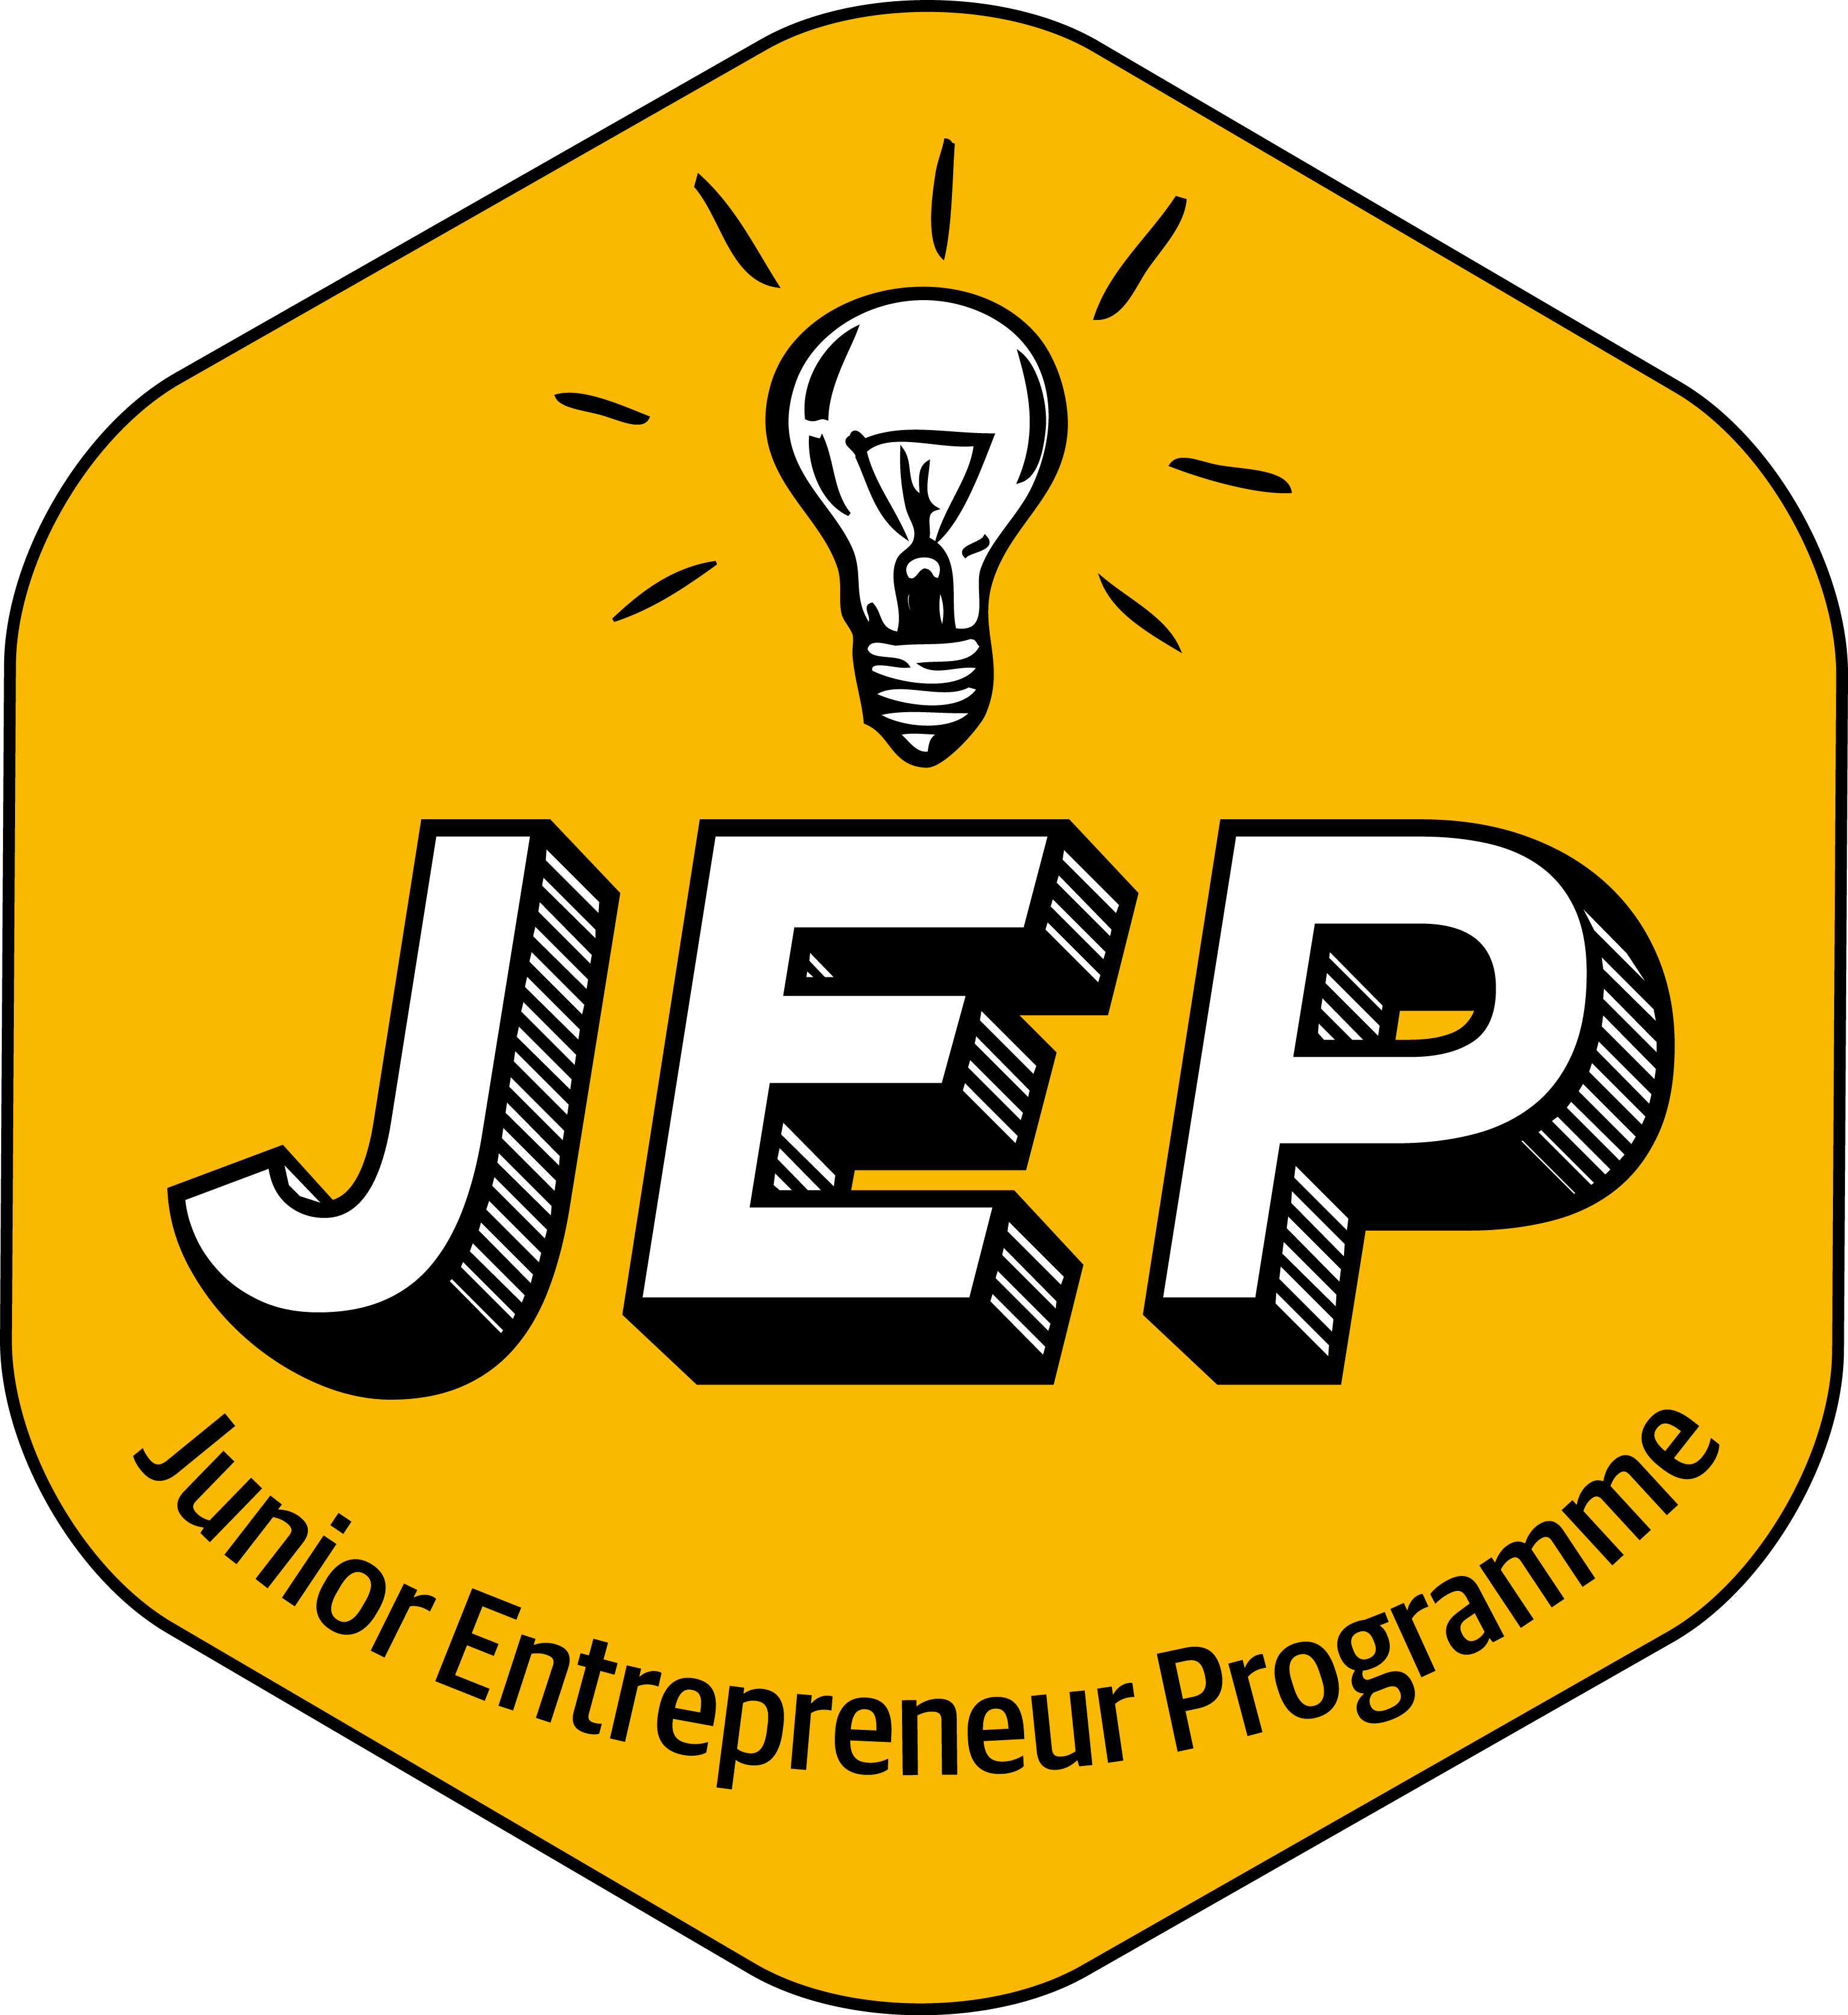 Junior Entrepreneur Programme |